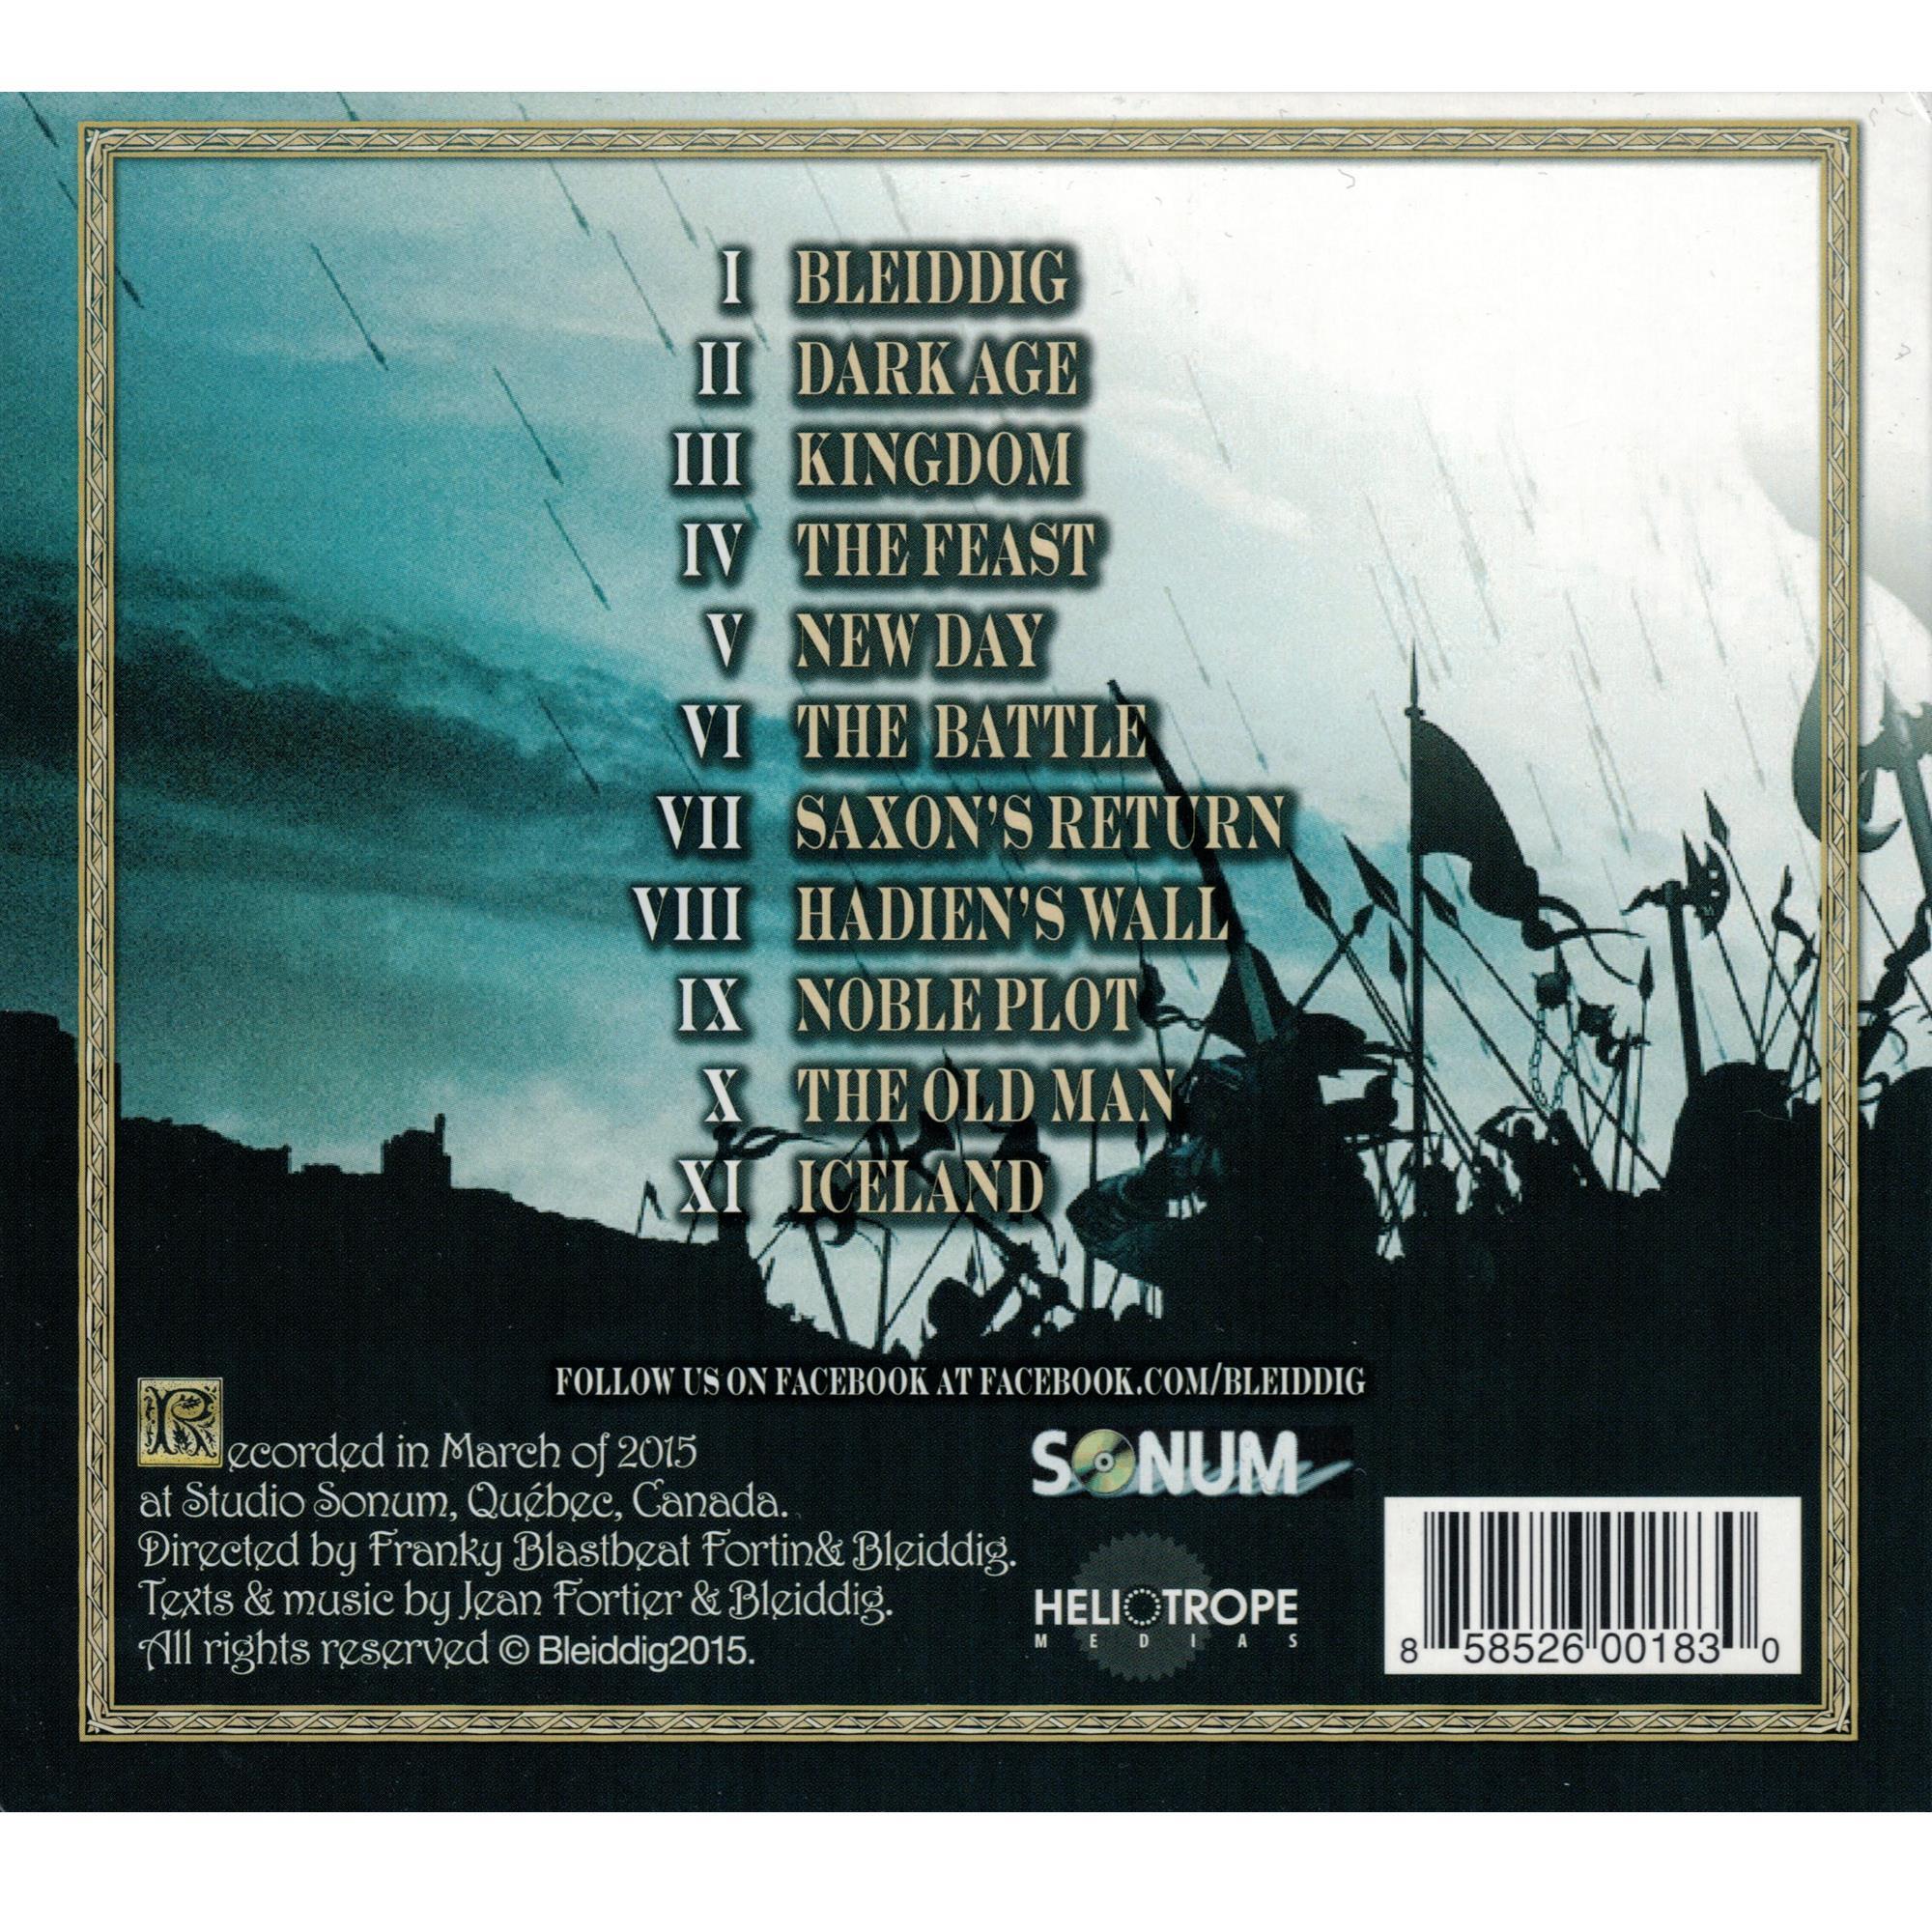 Dark Age CD